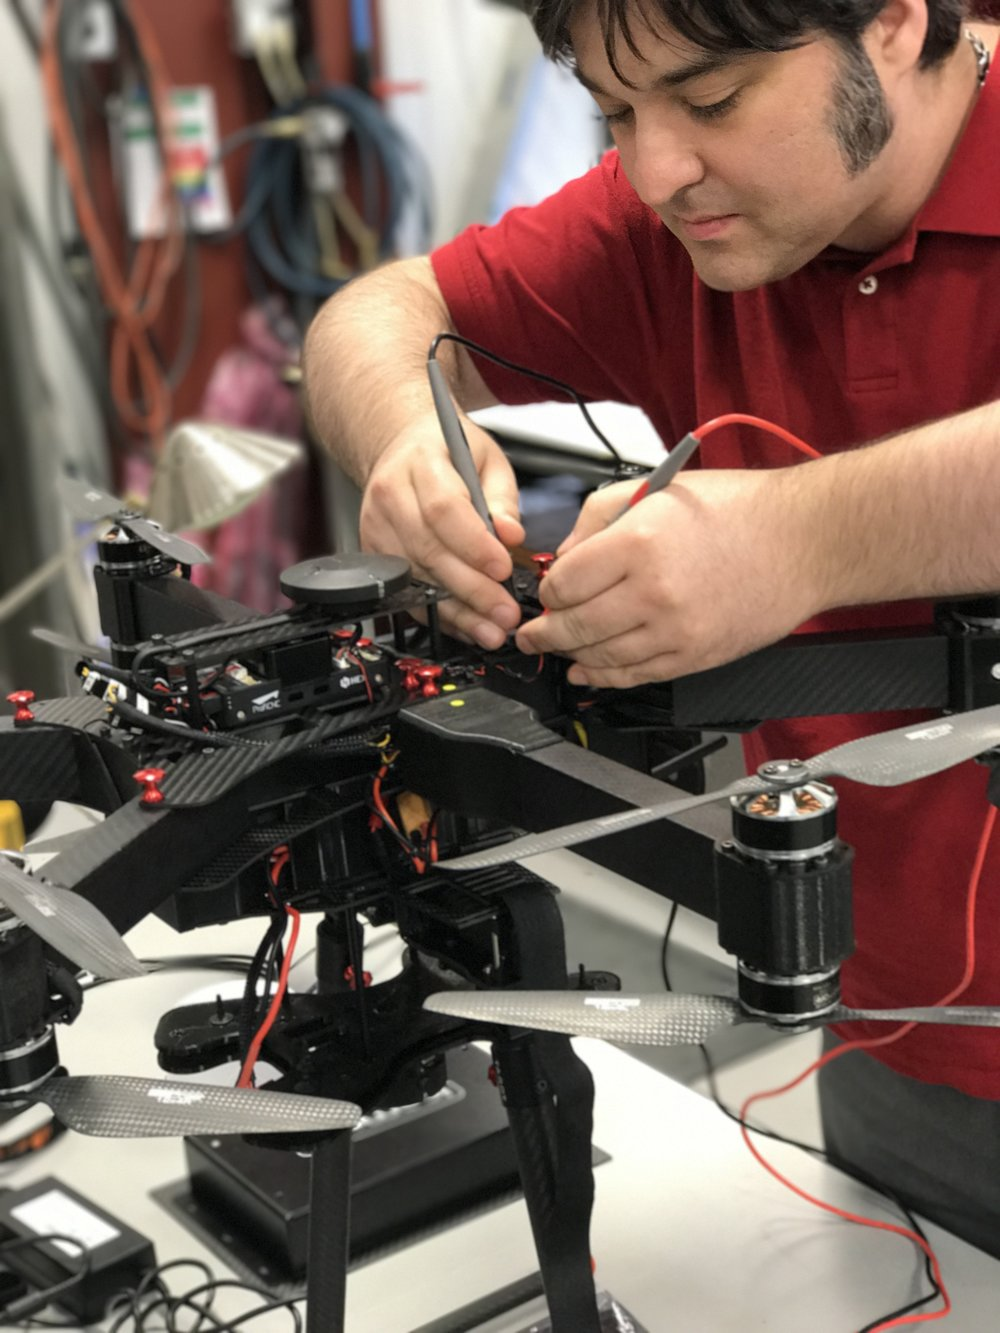 PlatformAerospace_Drone 02.jpg